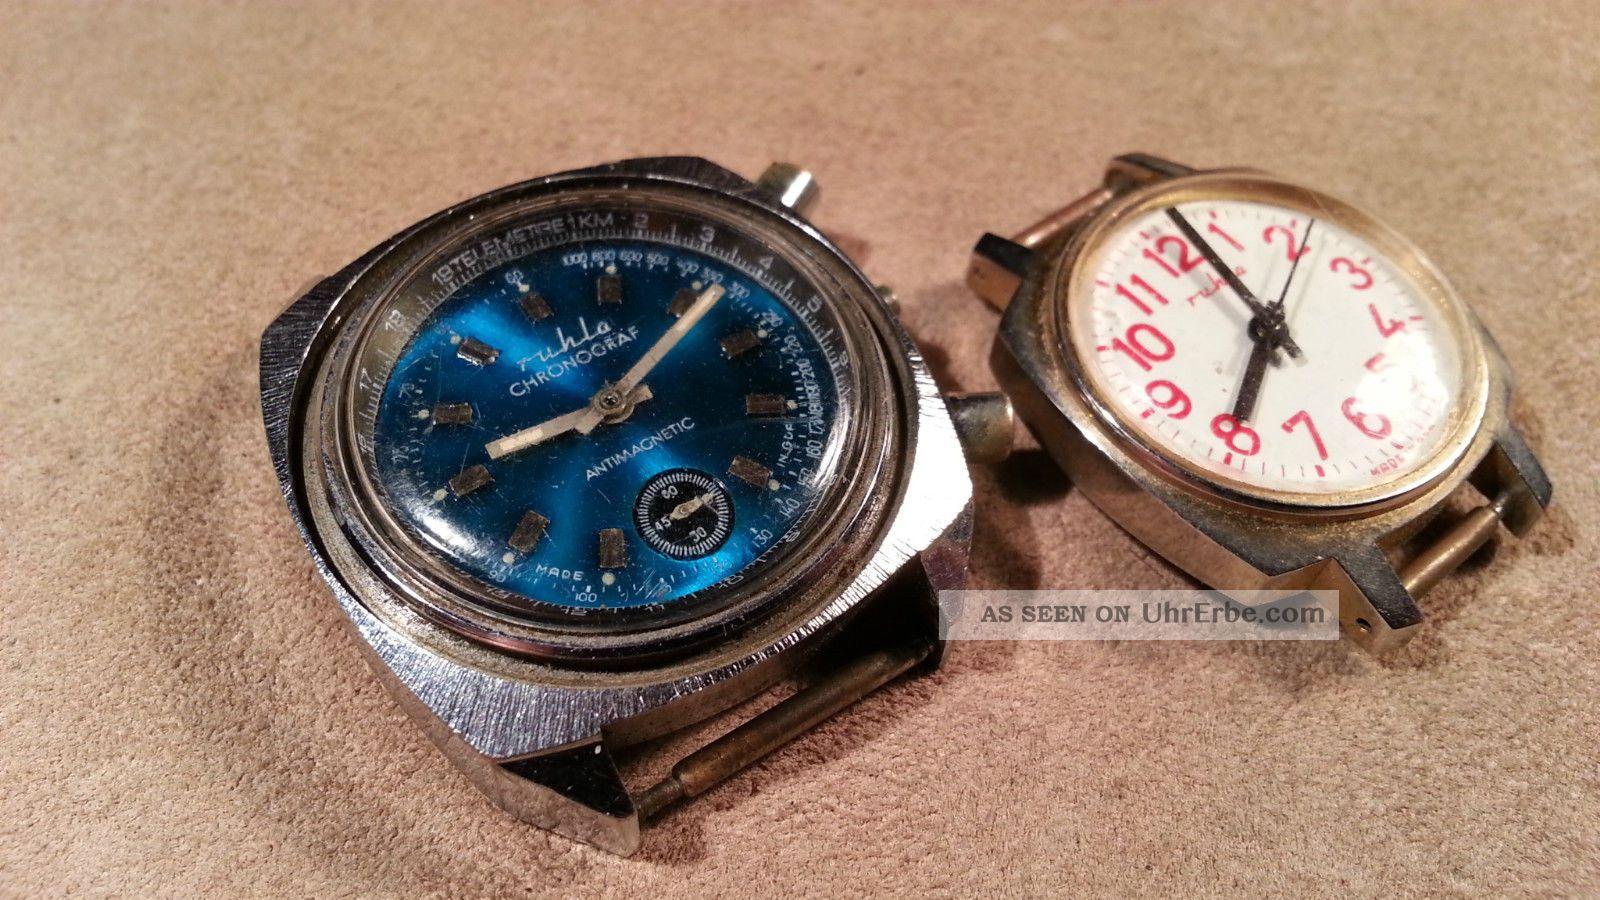 2 Vintage Ruhla Taucheruhr Chronograph Diver Made In Ddr Fuer Bastler Armbanduhren Bild